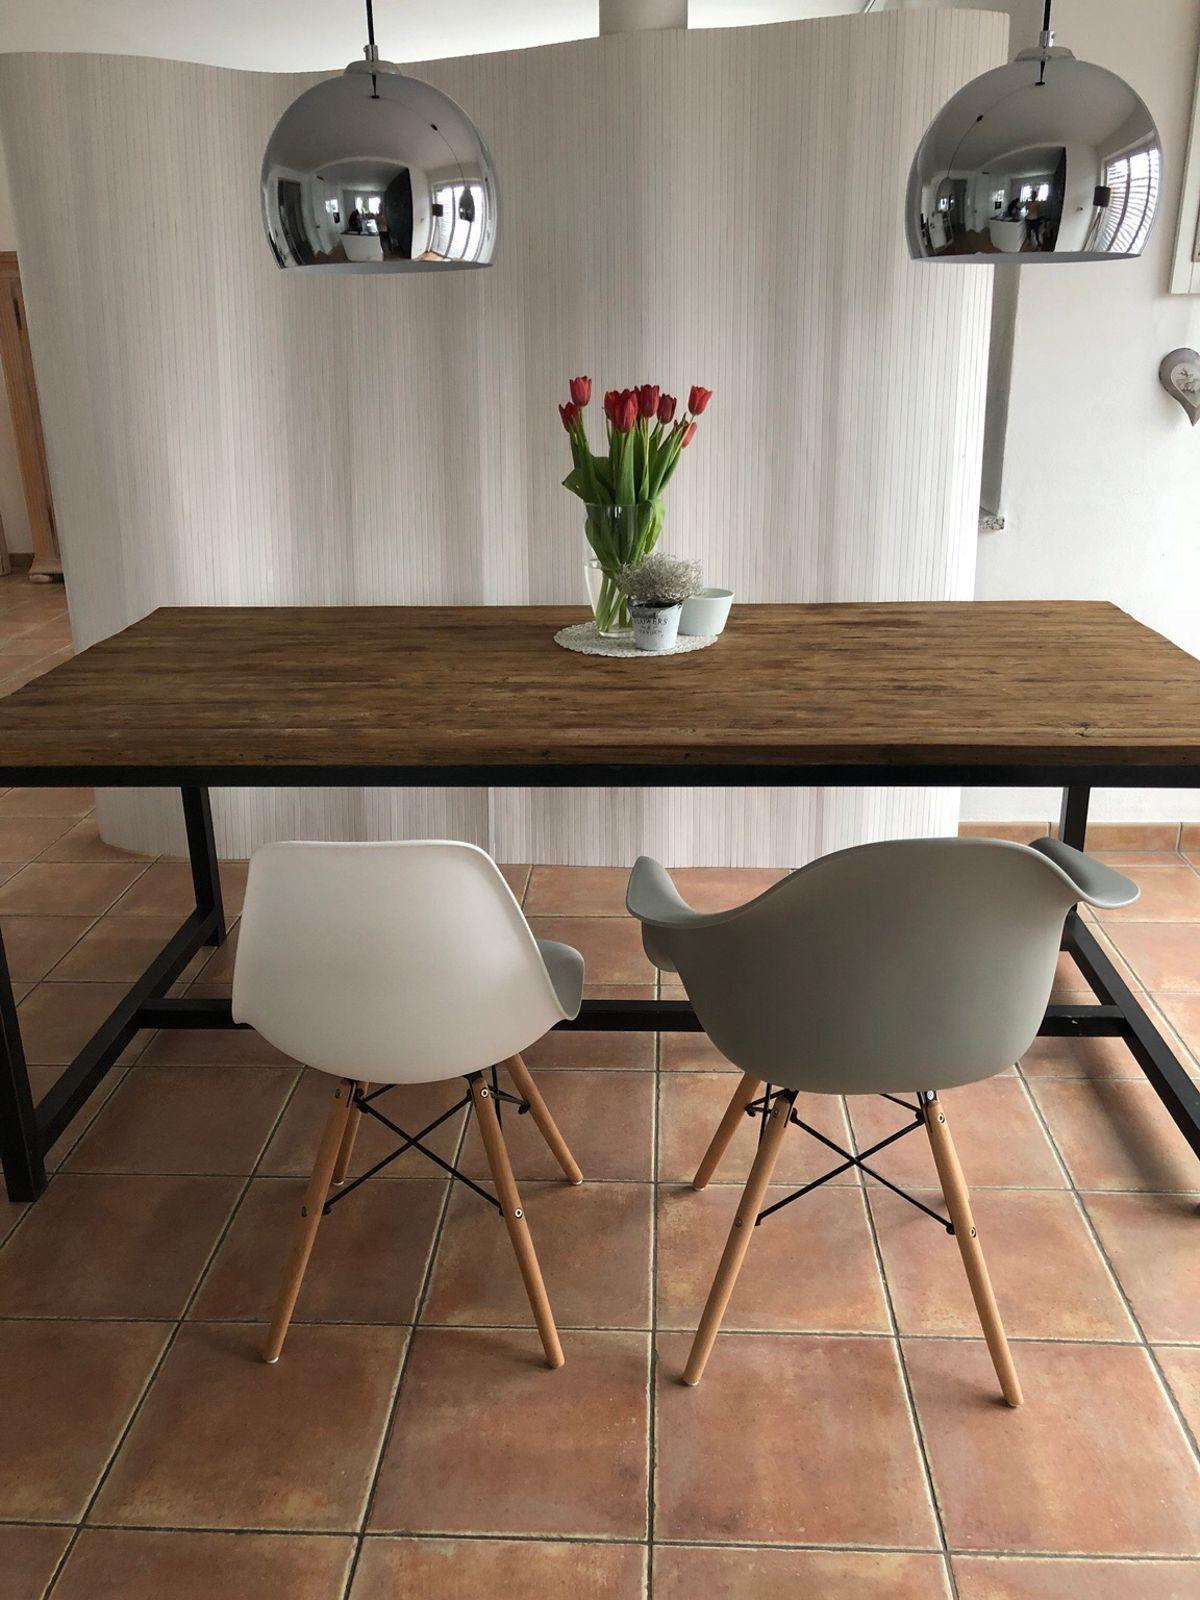 Drehstuhl Esszimmer Ikea